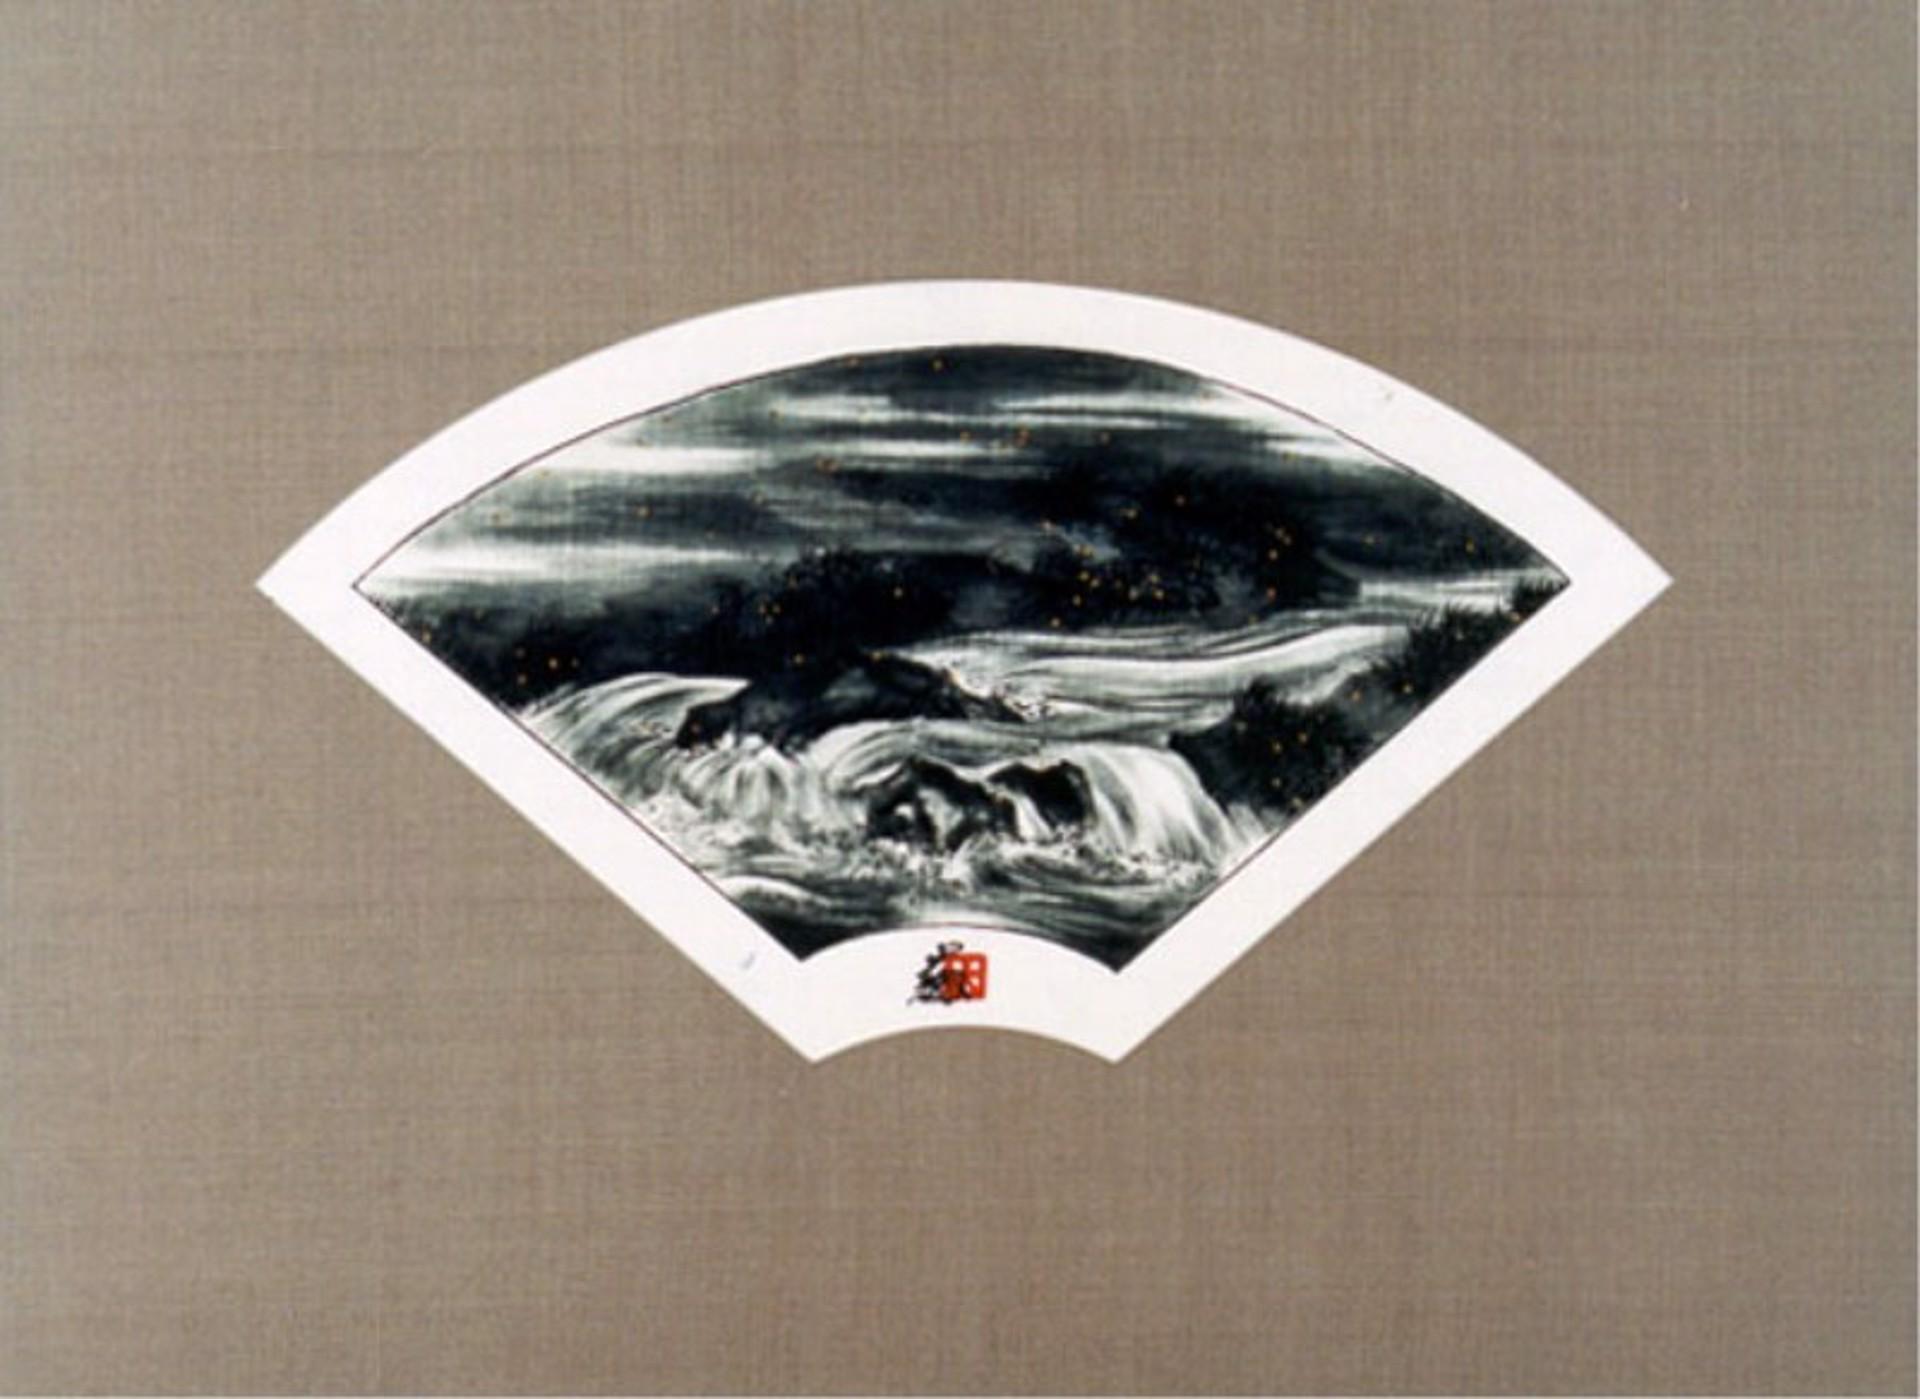 B/W Fan - Stream - Rapids by Hisashi Otsuka